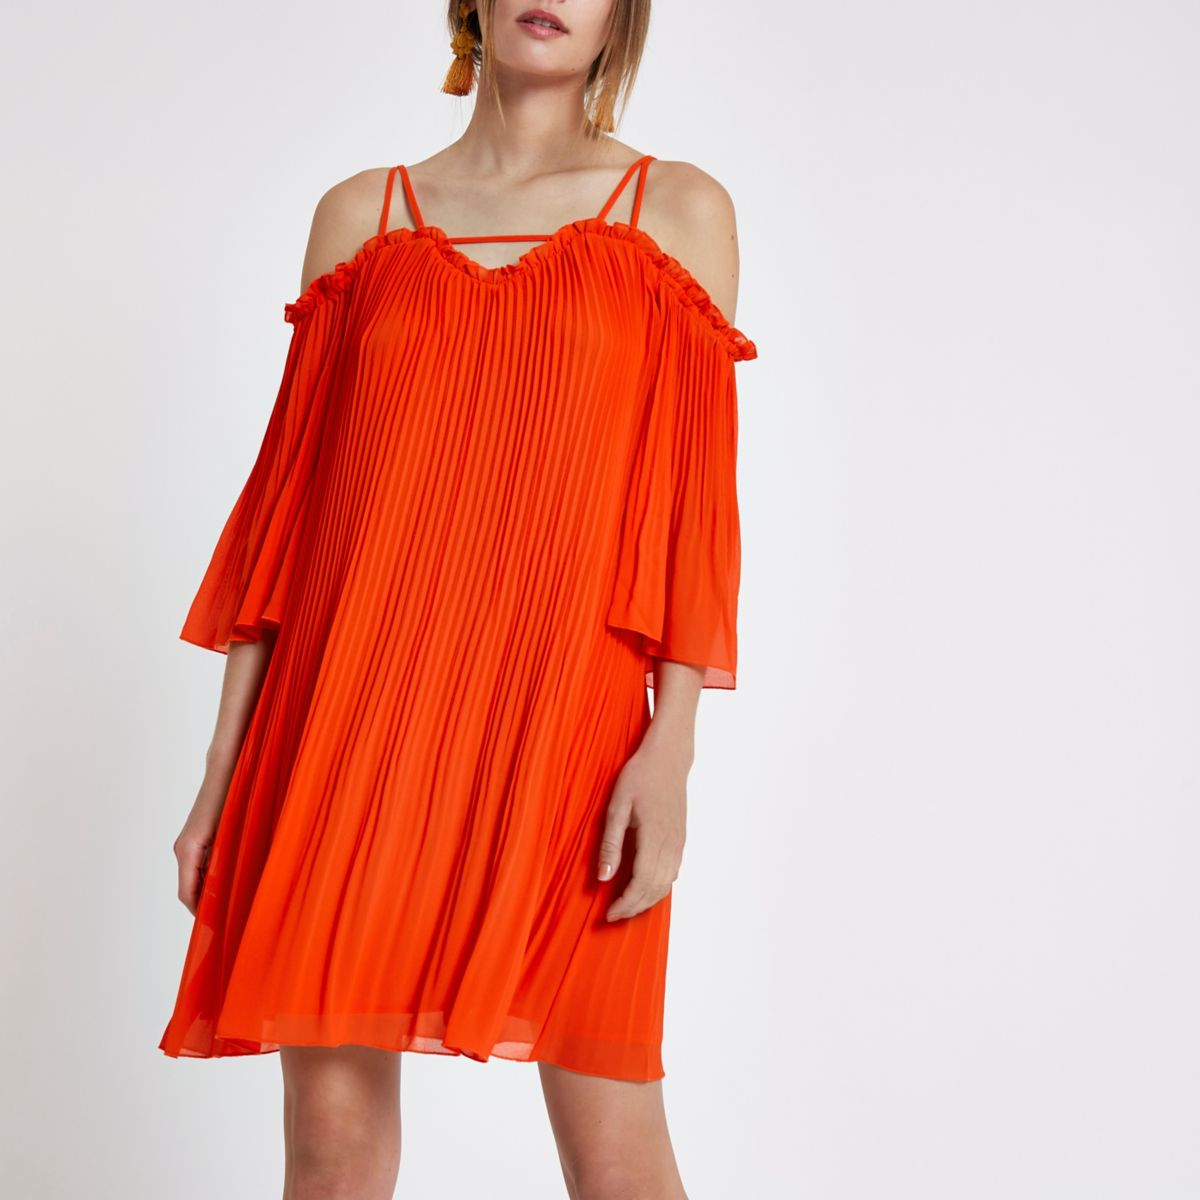 Red plisse chiffon cold shoulder swing dress